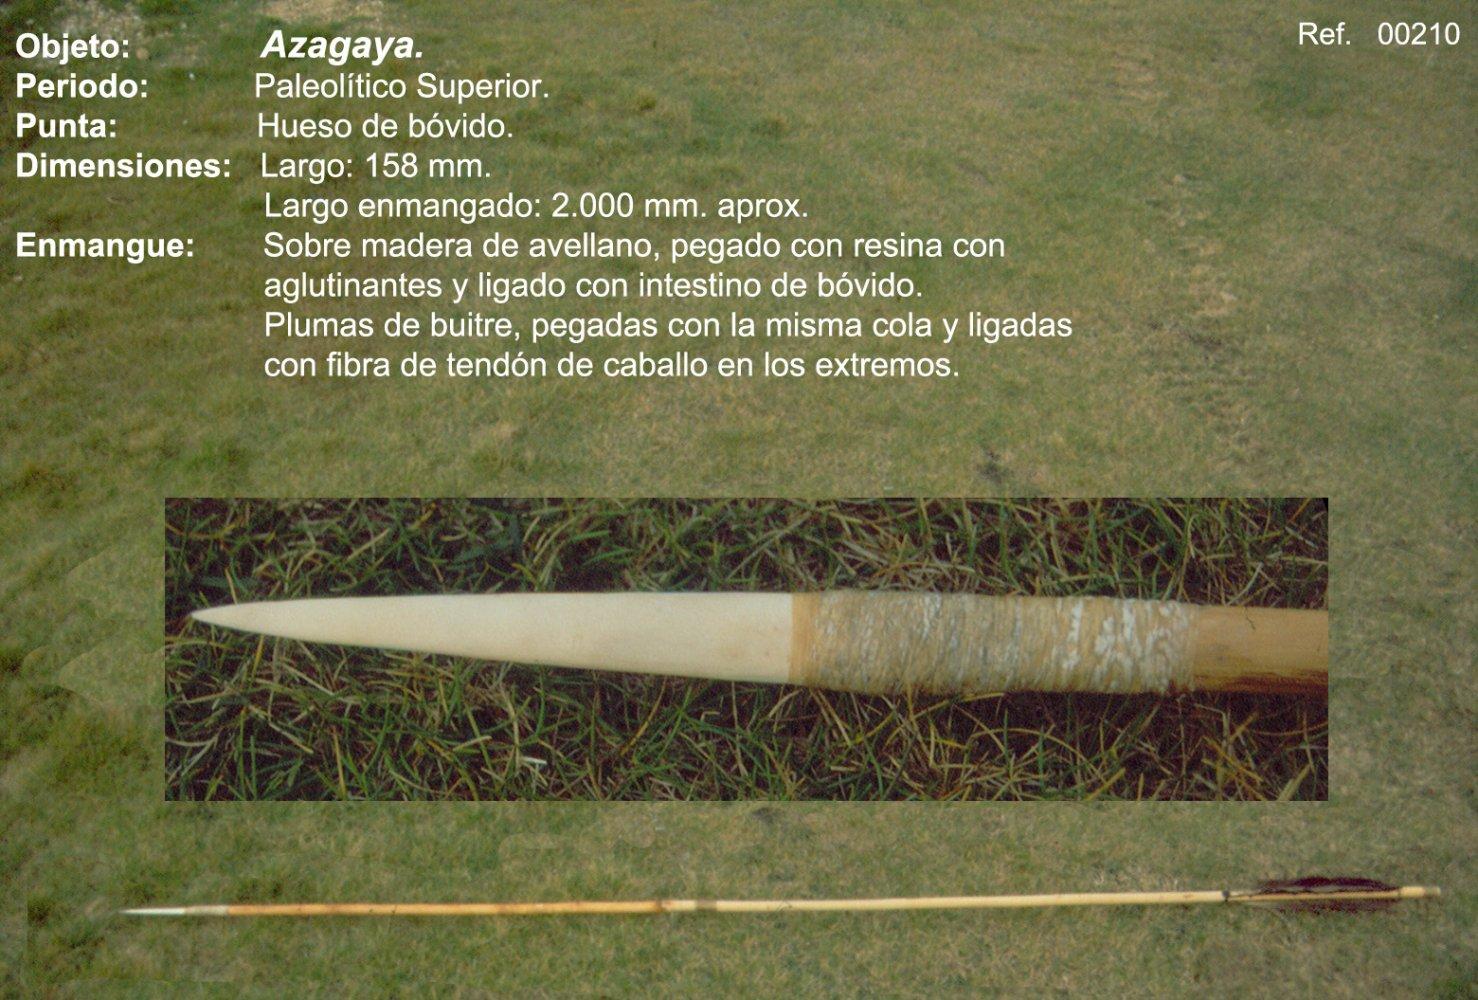 00210 Azagaya-hueso